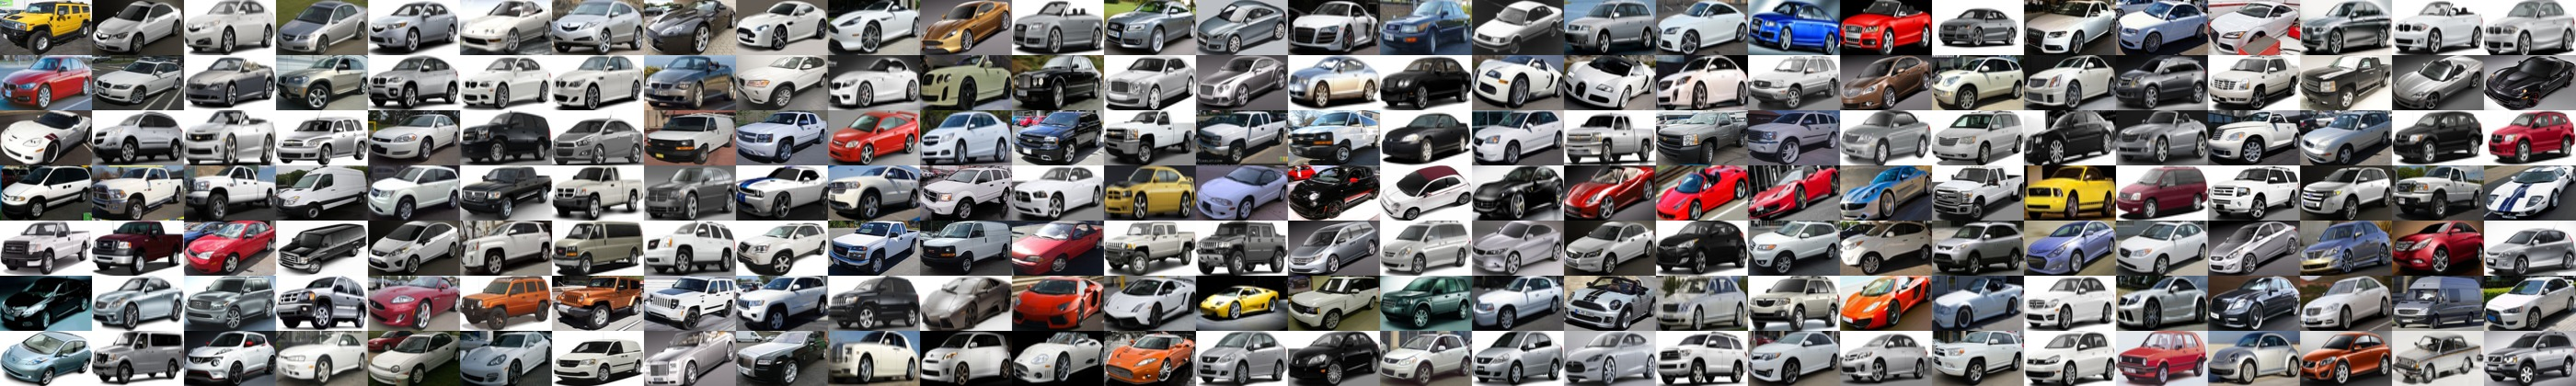 Stanford Cars Dataset | Kaggle